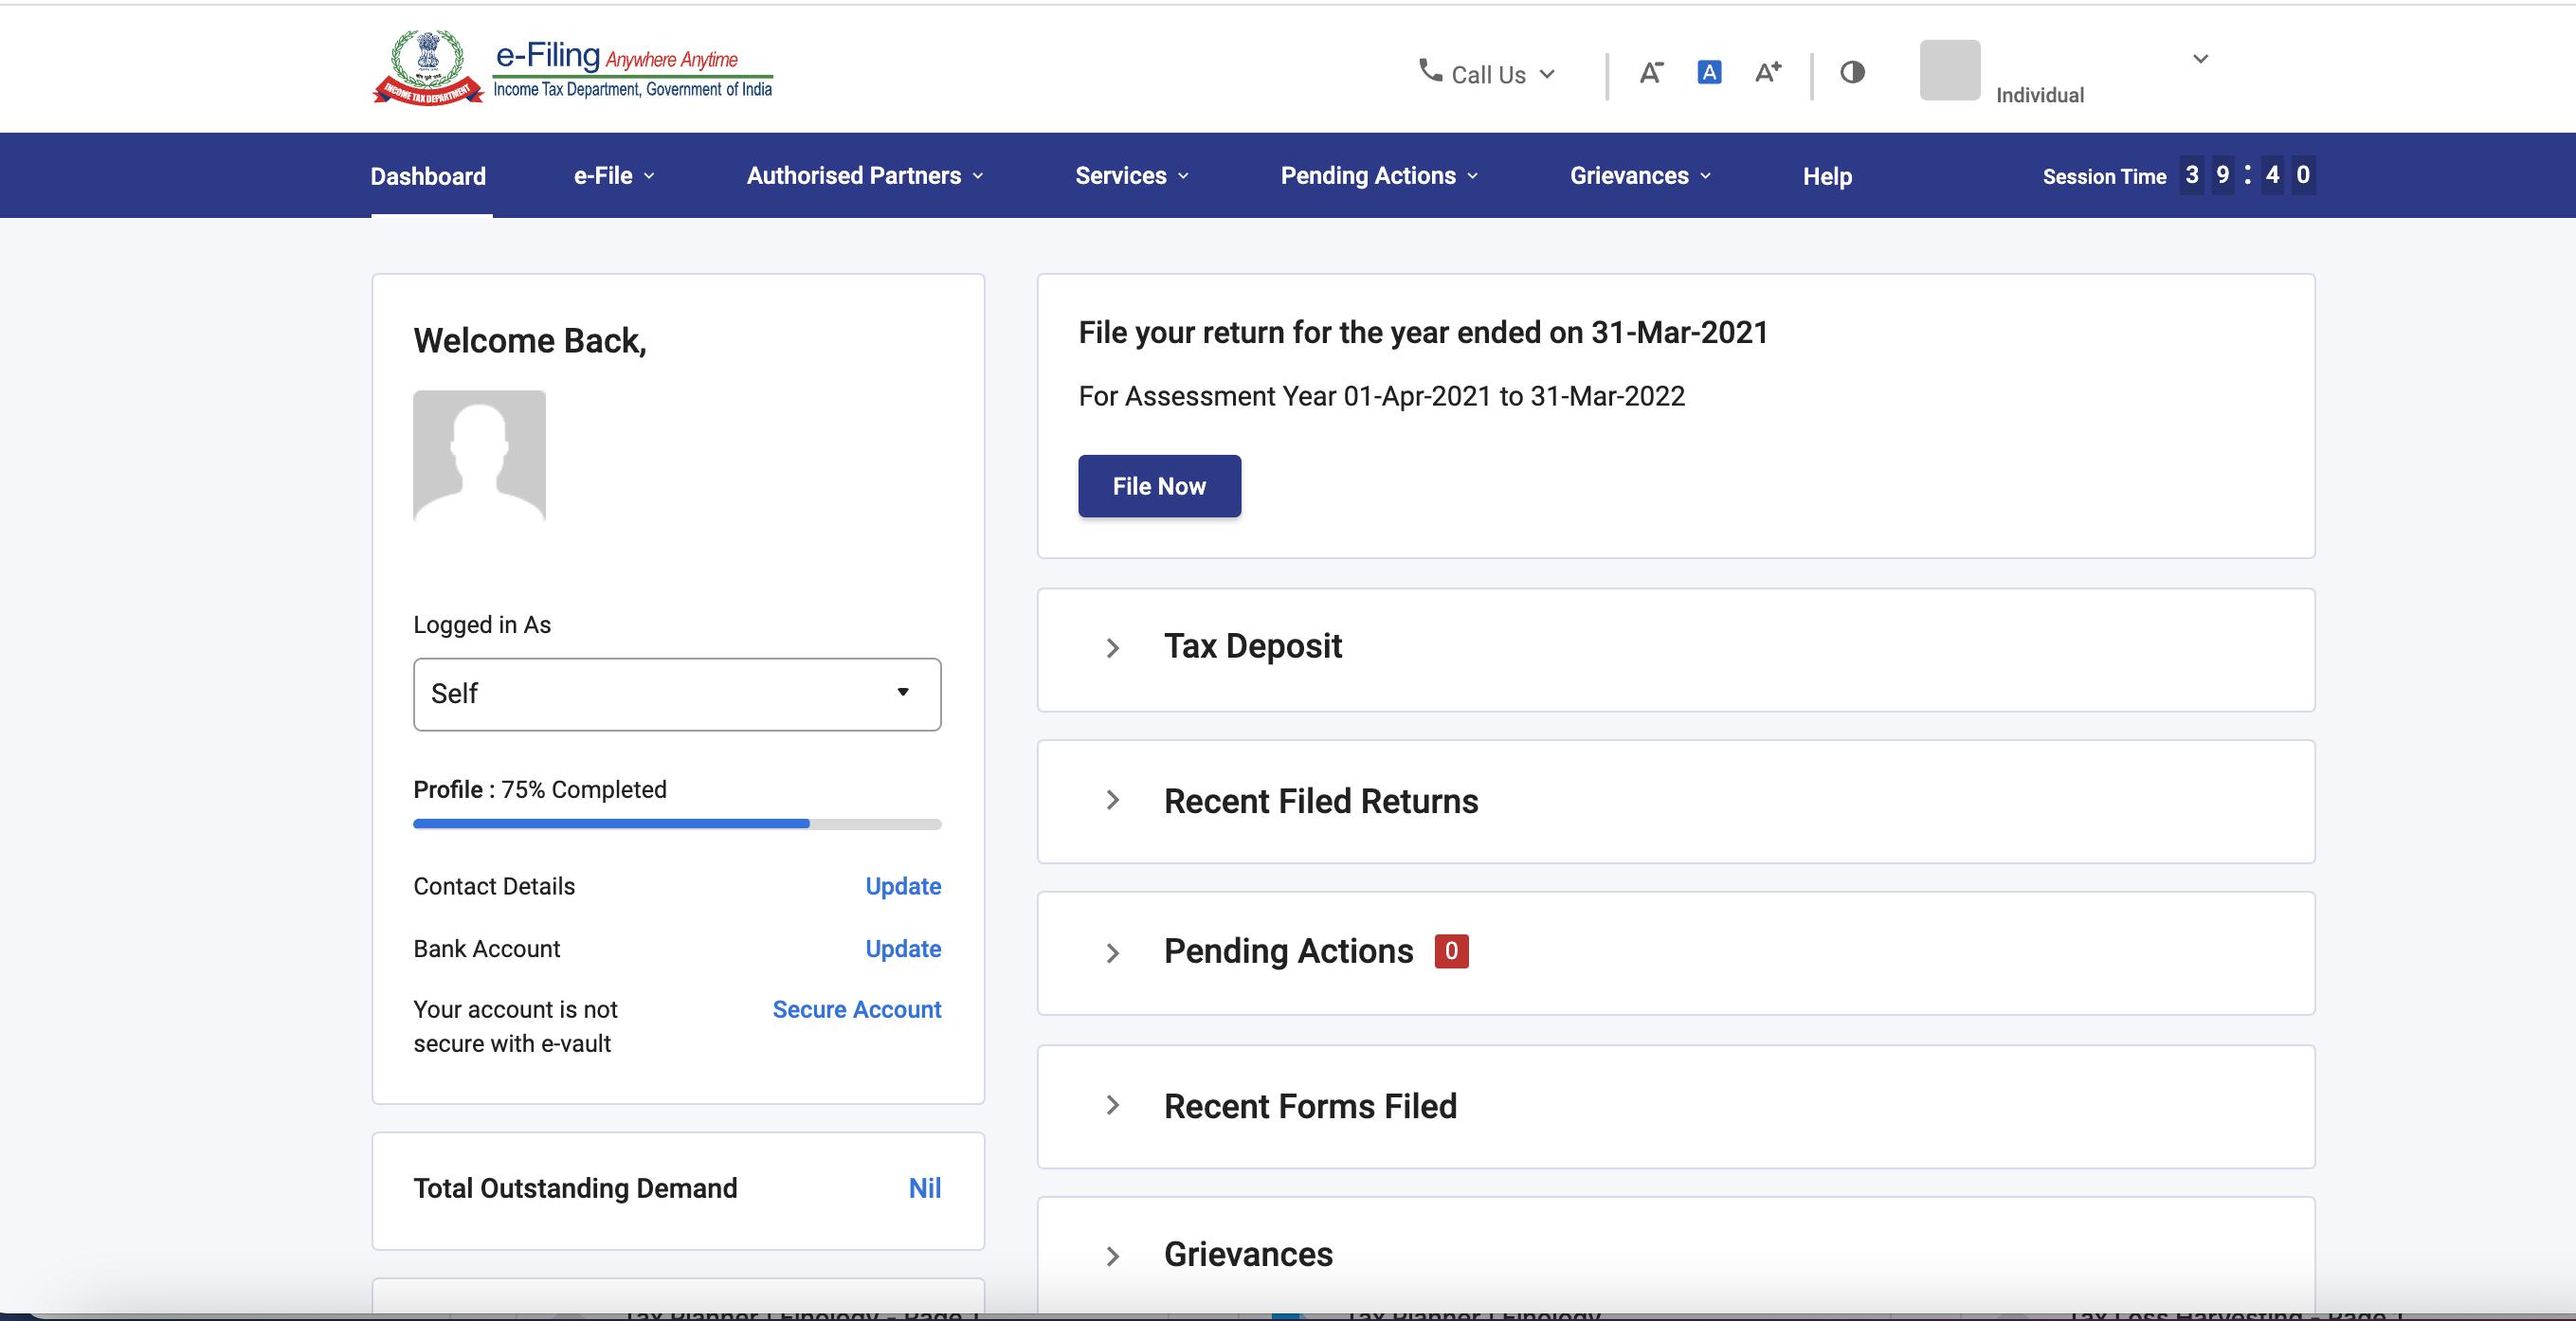 www.incometax.gov.in - Dashboard